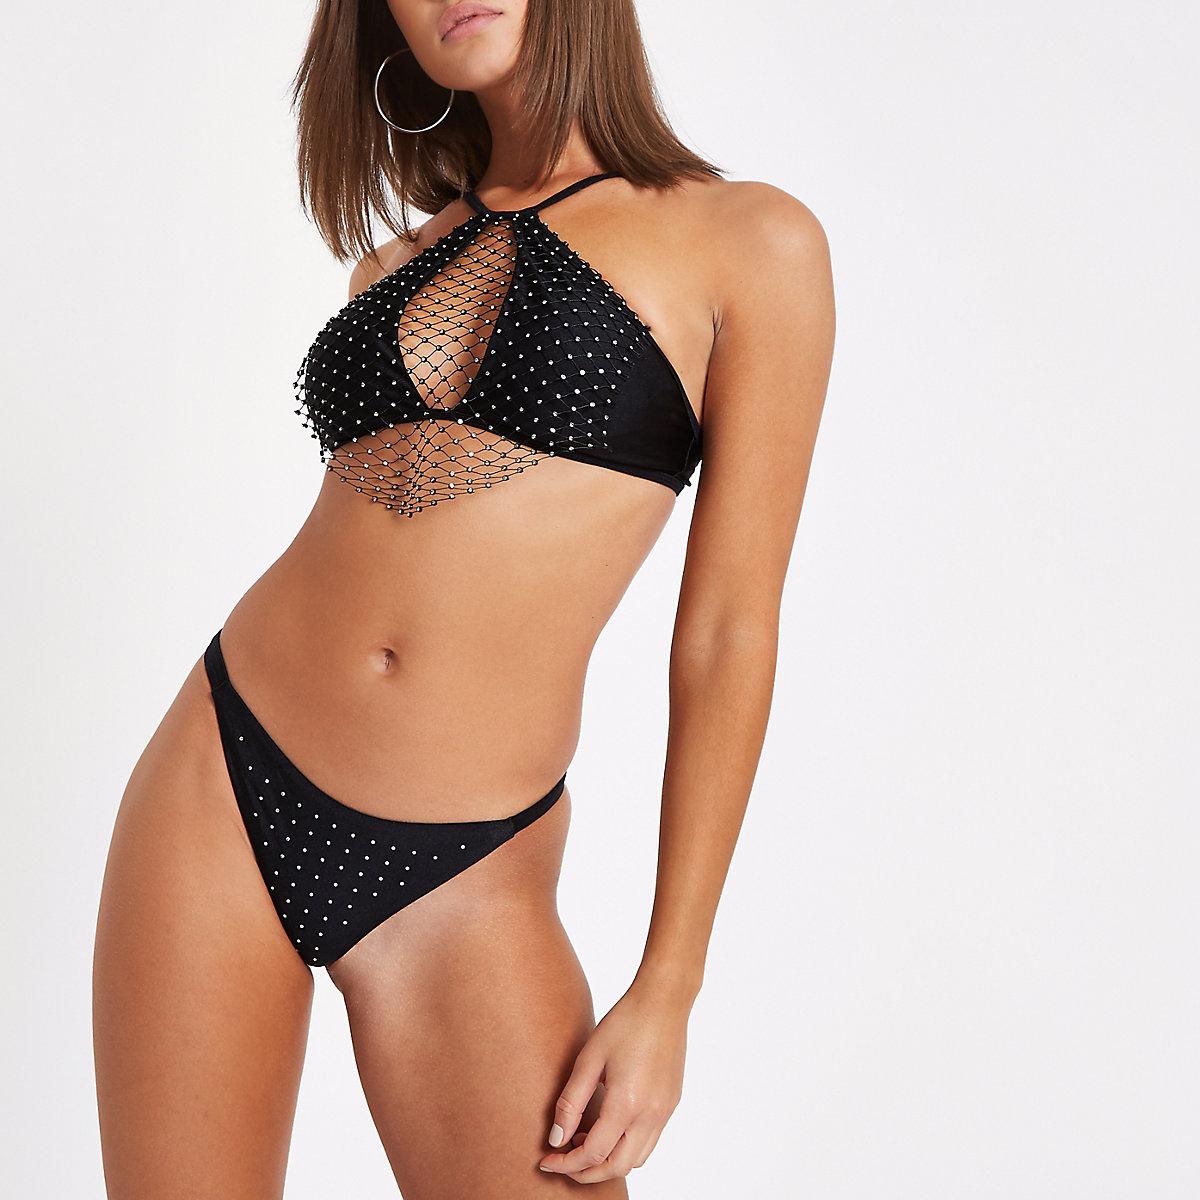 Bas de bikini string noir à strass